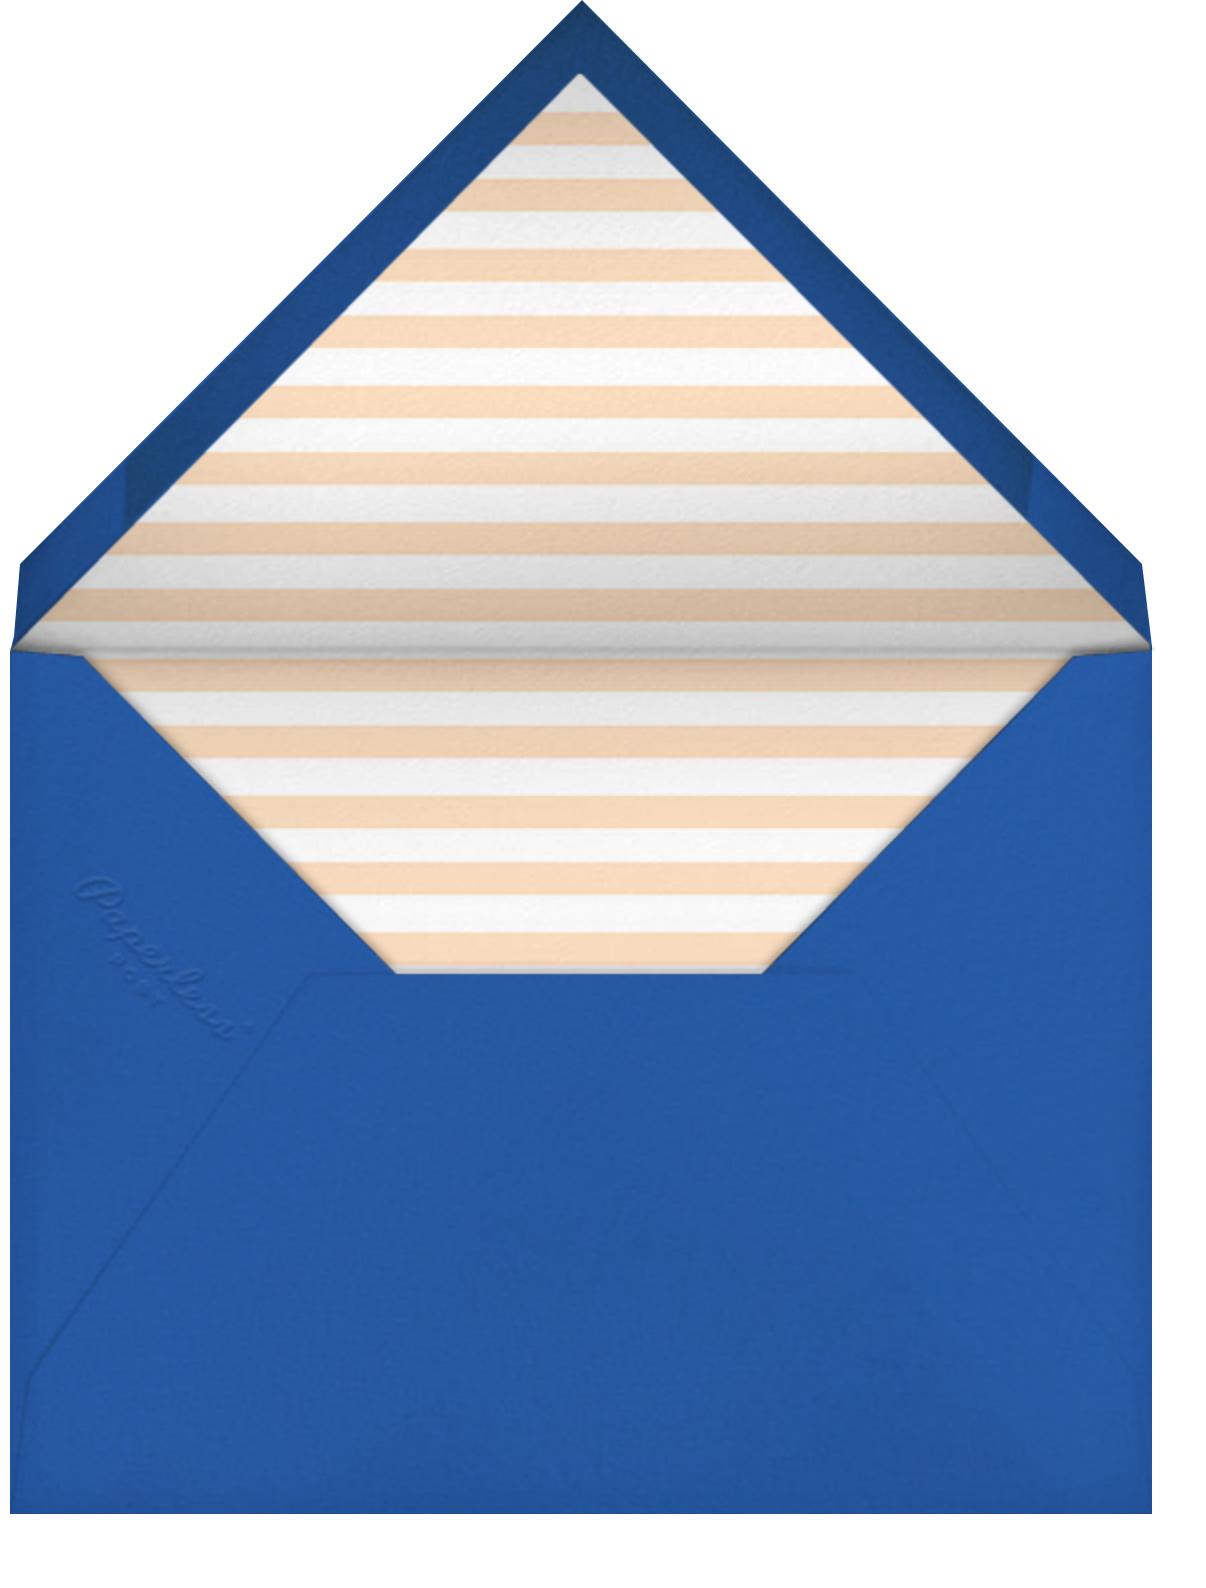 A Bear in the Tent - Blue - Mr. Boddington's Studio - Kids' birthday - envelope back